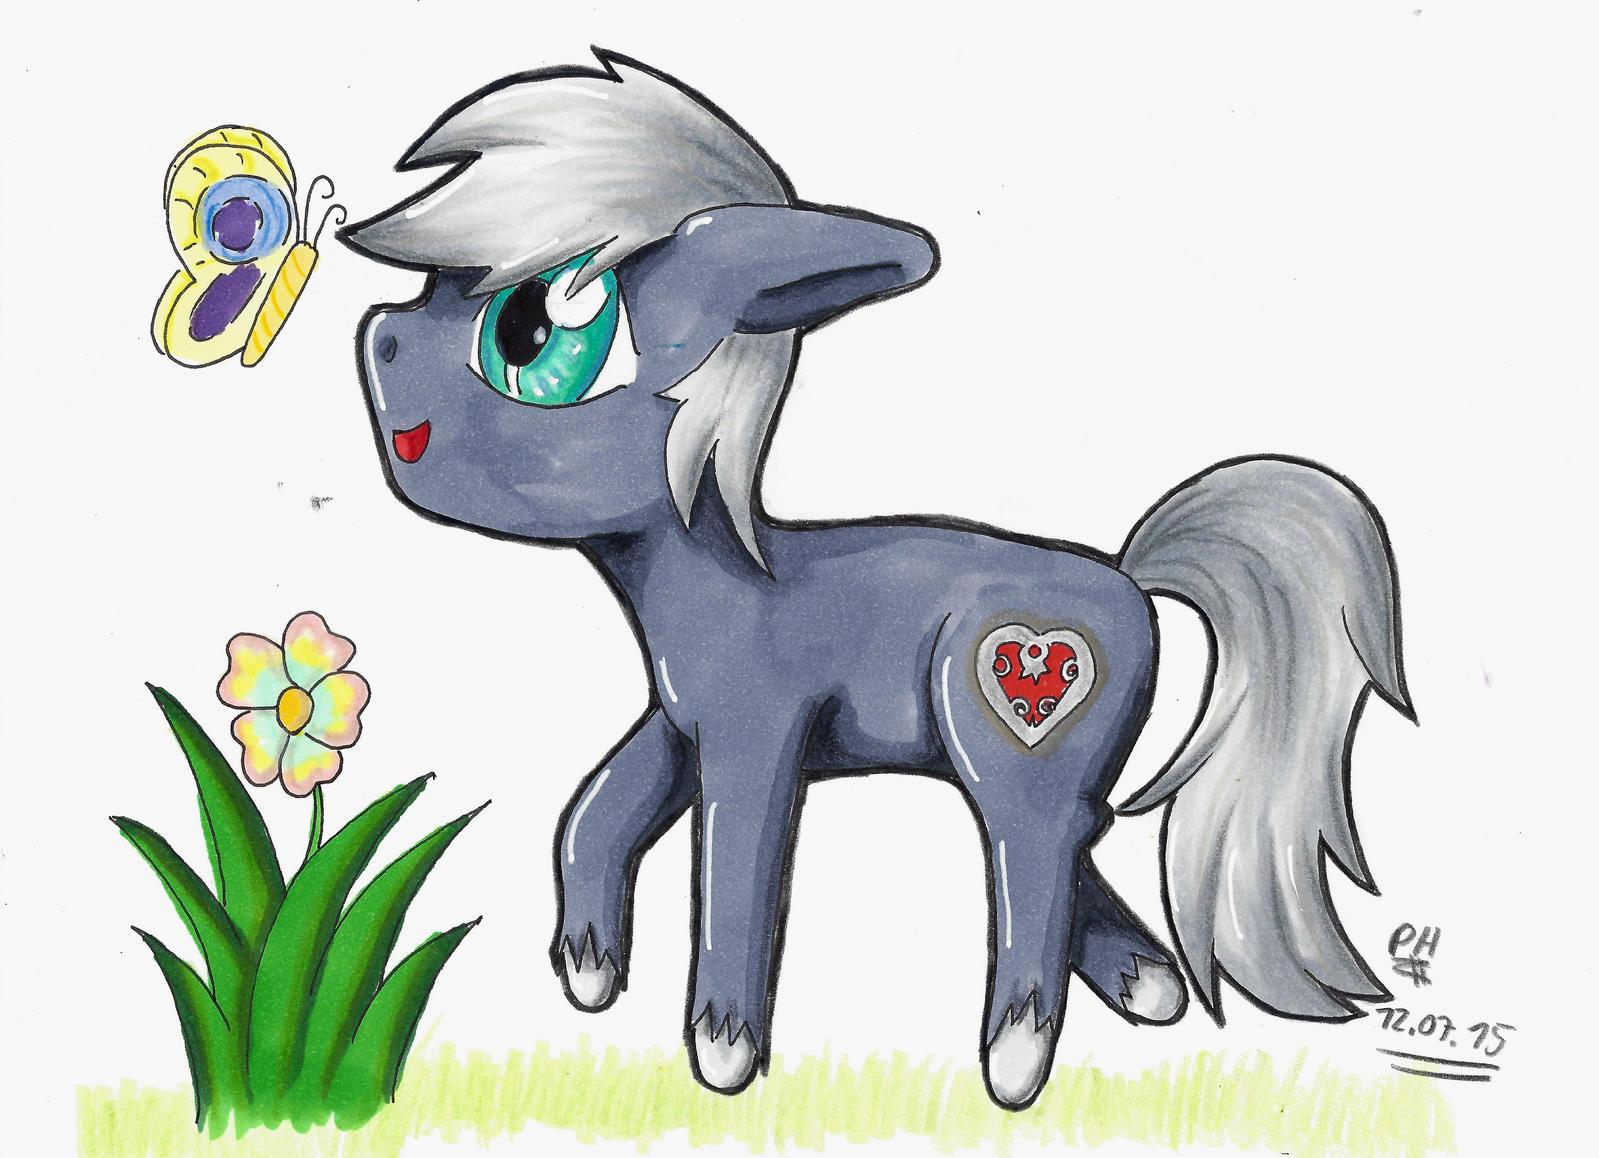 noch ein chibi pony by PanHaukatze